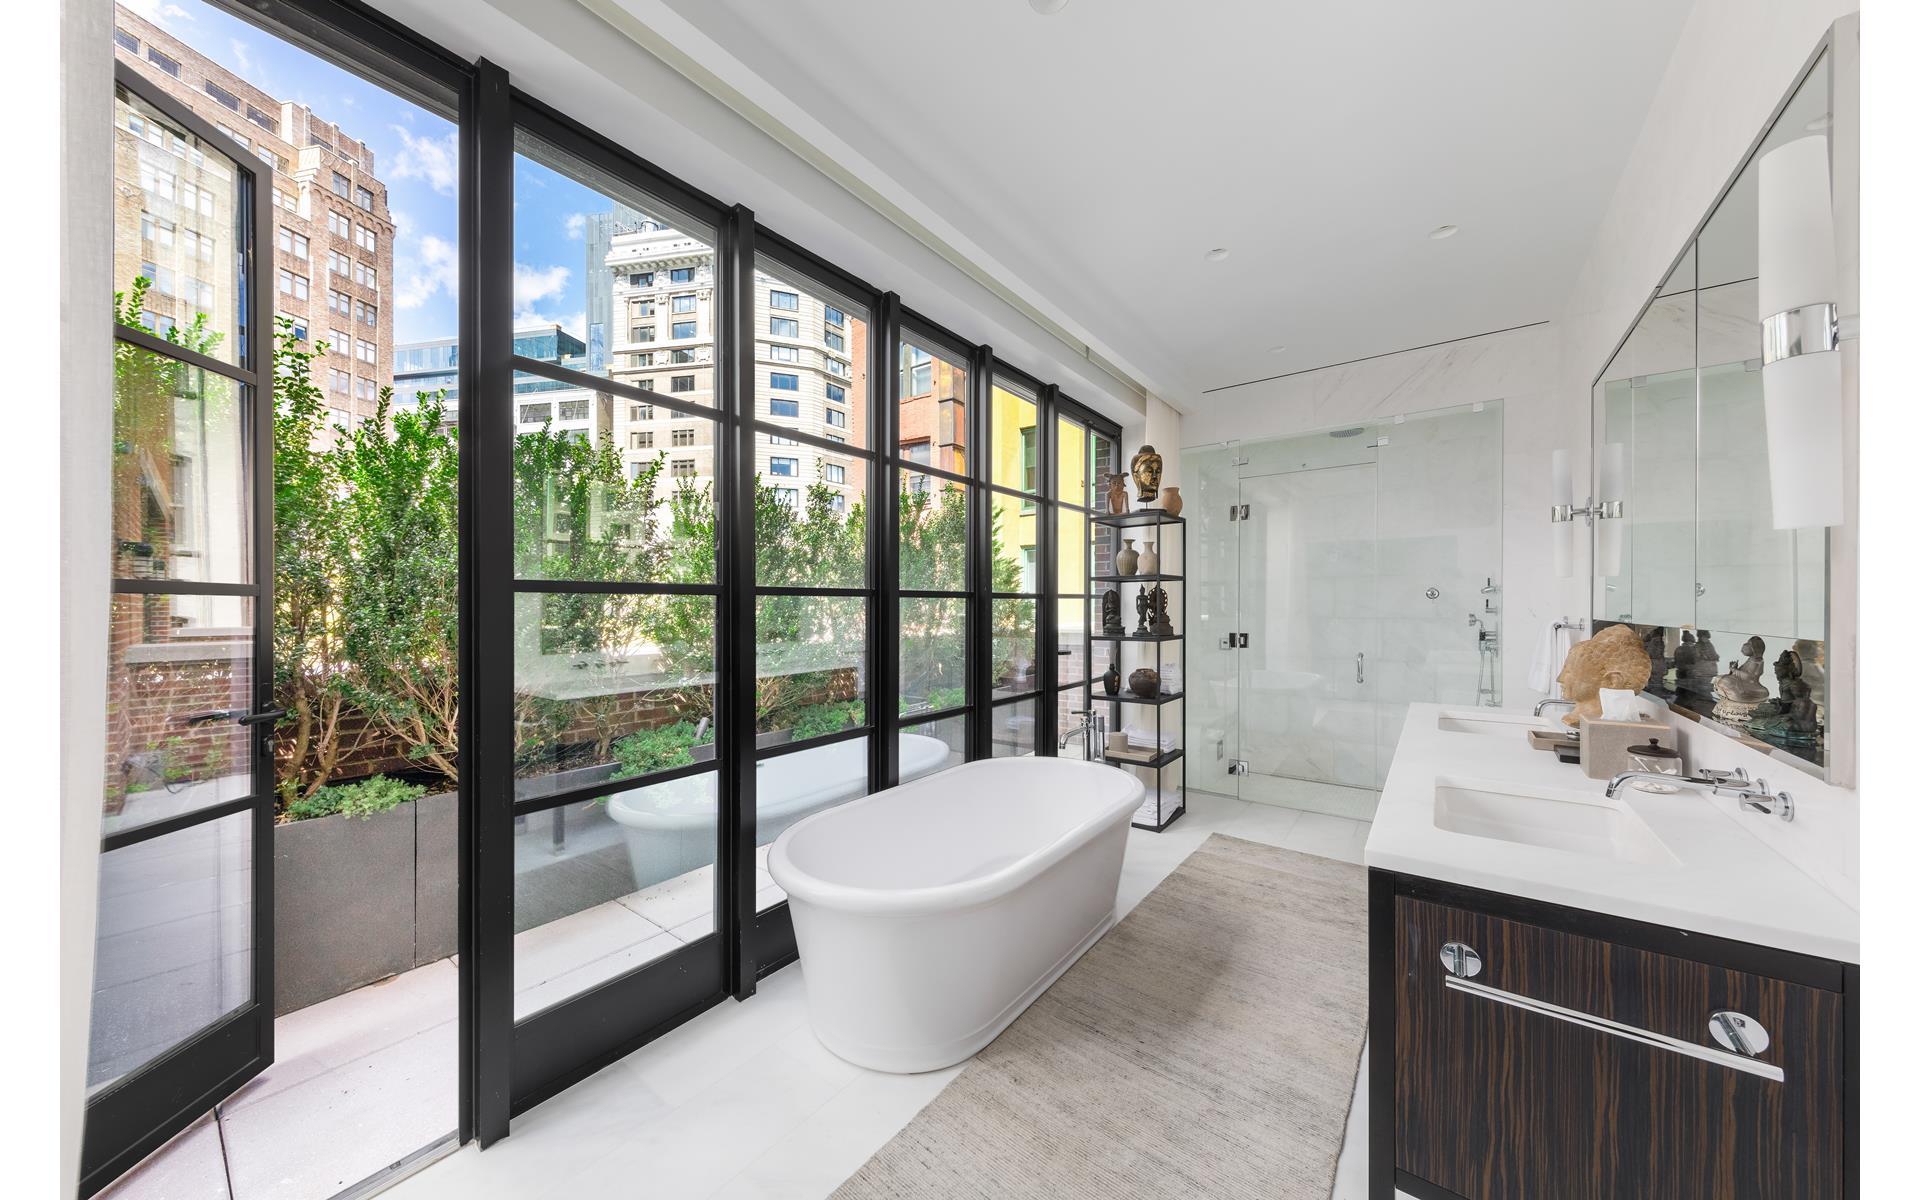 ванная комната ванна душевая кабина раковина комод панорамное остекление выход на террасу